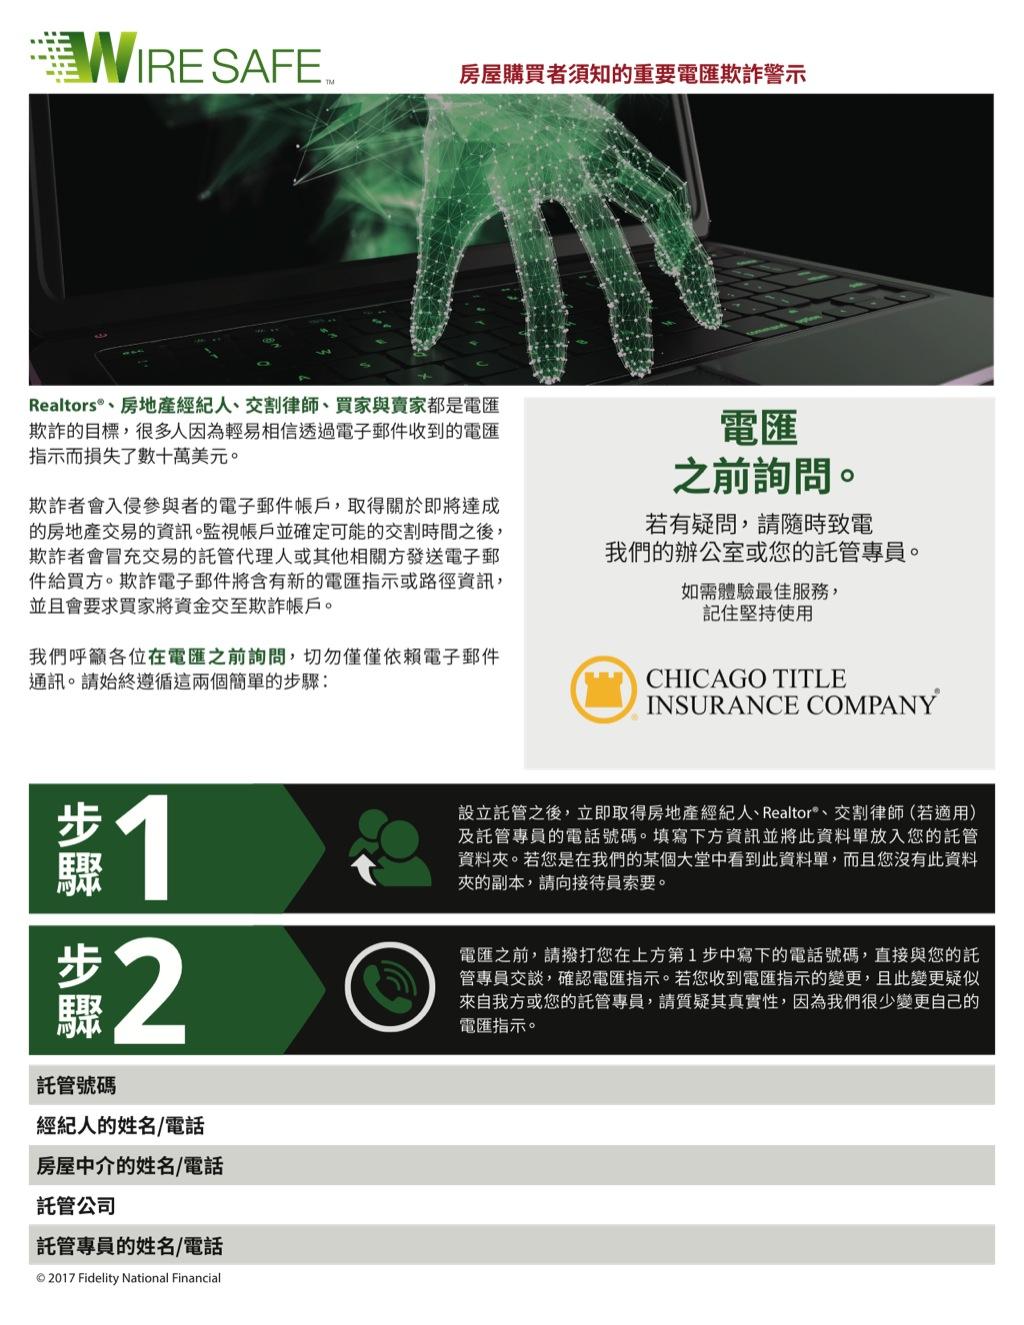 Corefact Wire Safe Buyer Flyer - Cantonese - CTIC